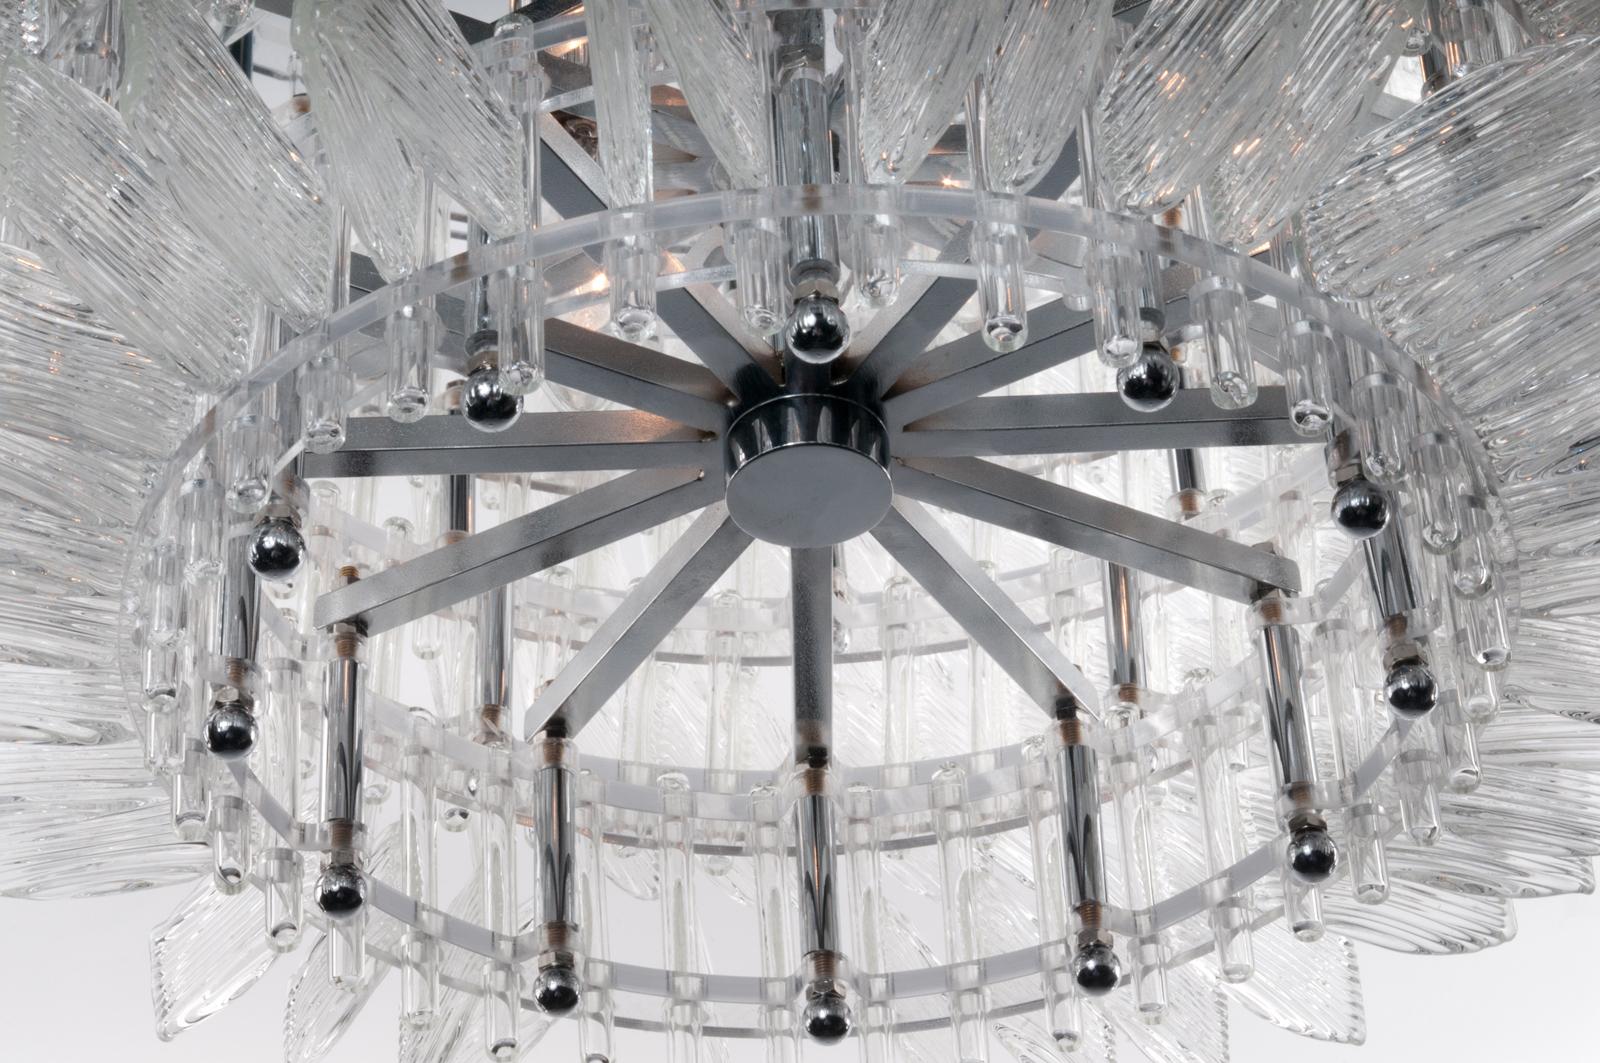 anemone-plafonnier-ceiling-veronese-tal-lancman-maurizio-galante-51.jpg